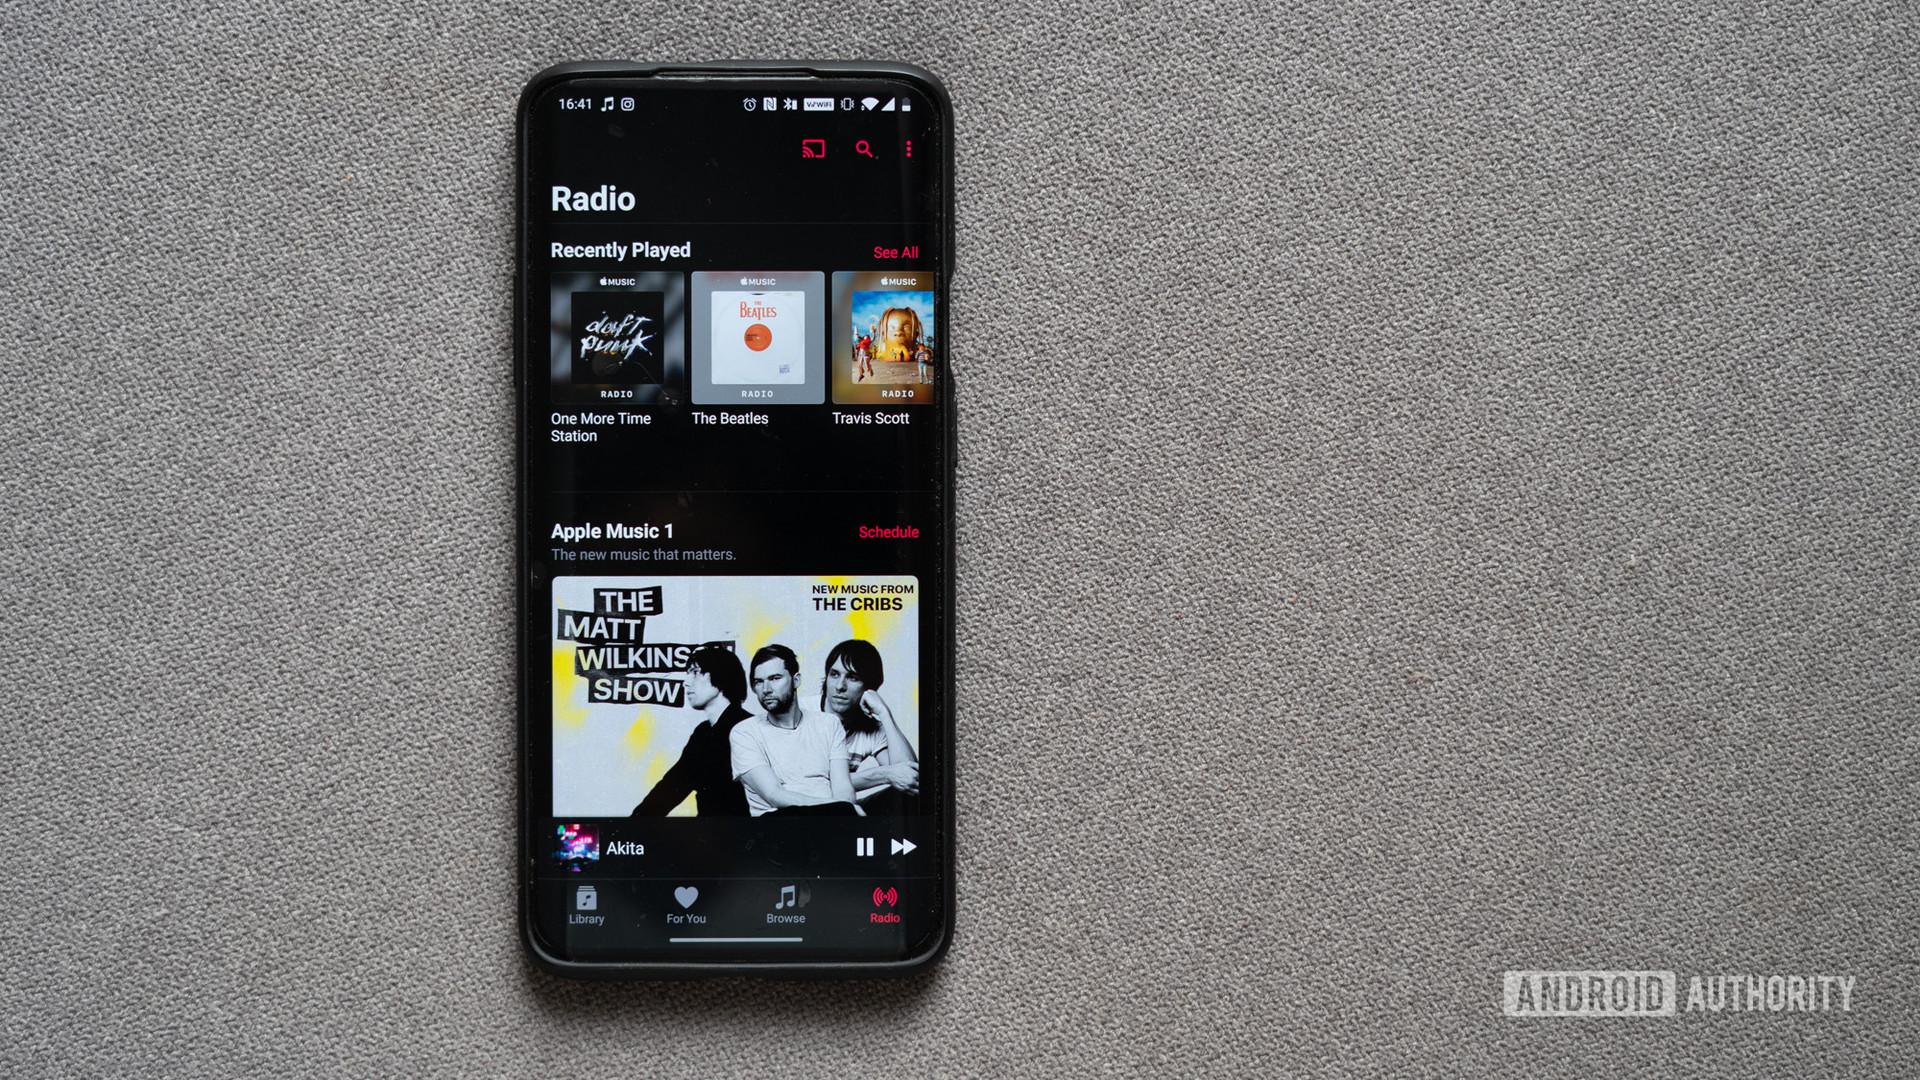 Apple Music home screen